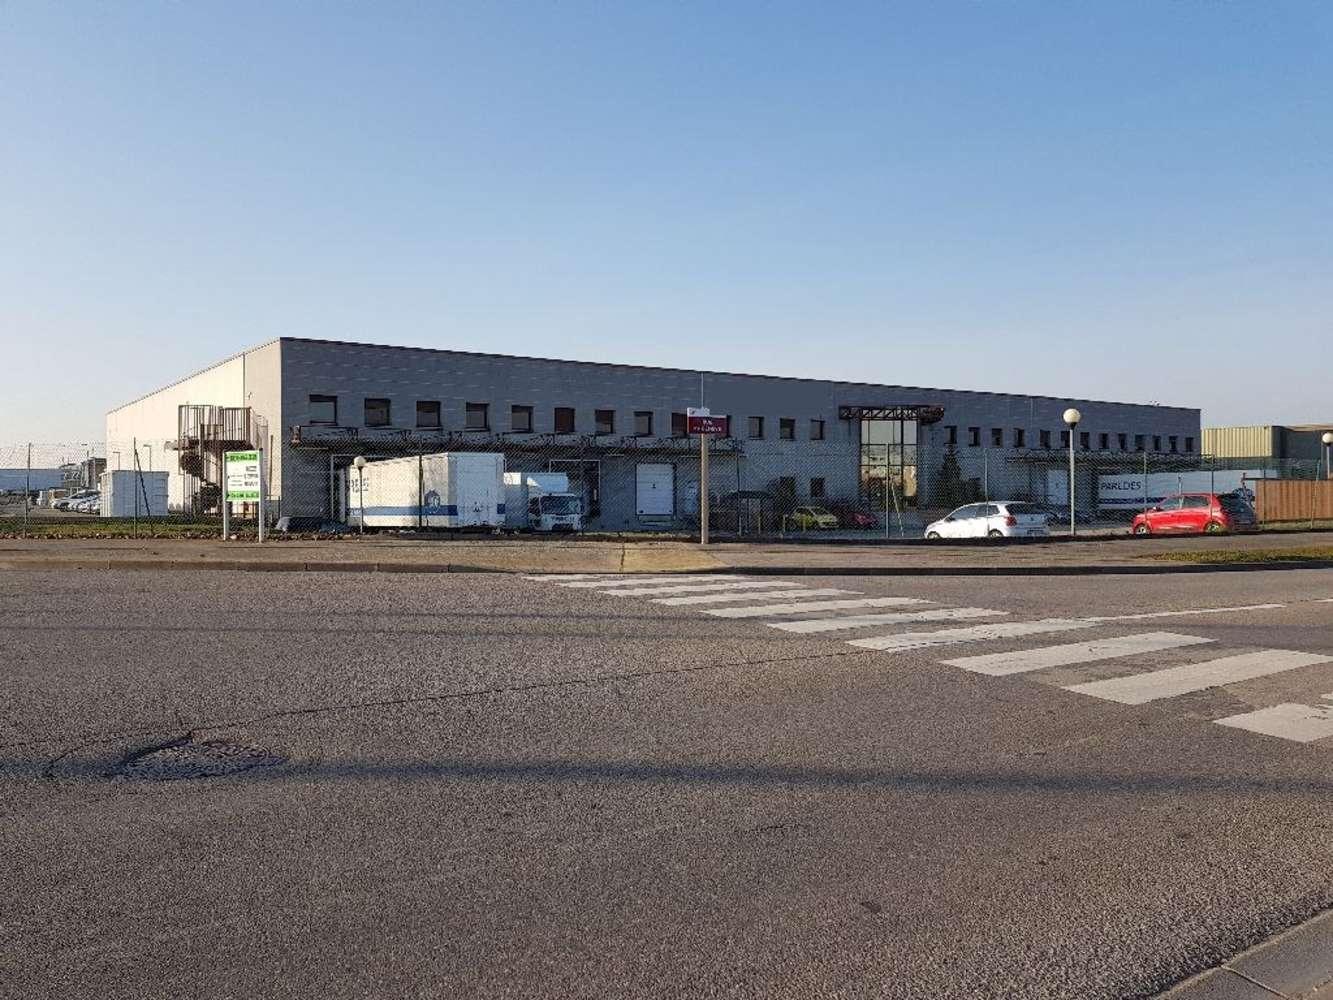 Activités/entrepôt Genas, 69740 - Location entrepot Genas - Lyon (69) - 10239892